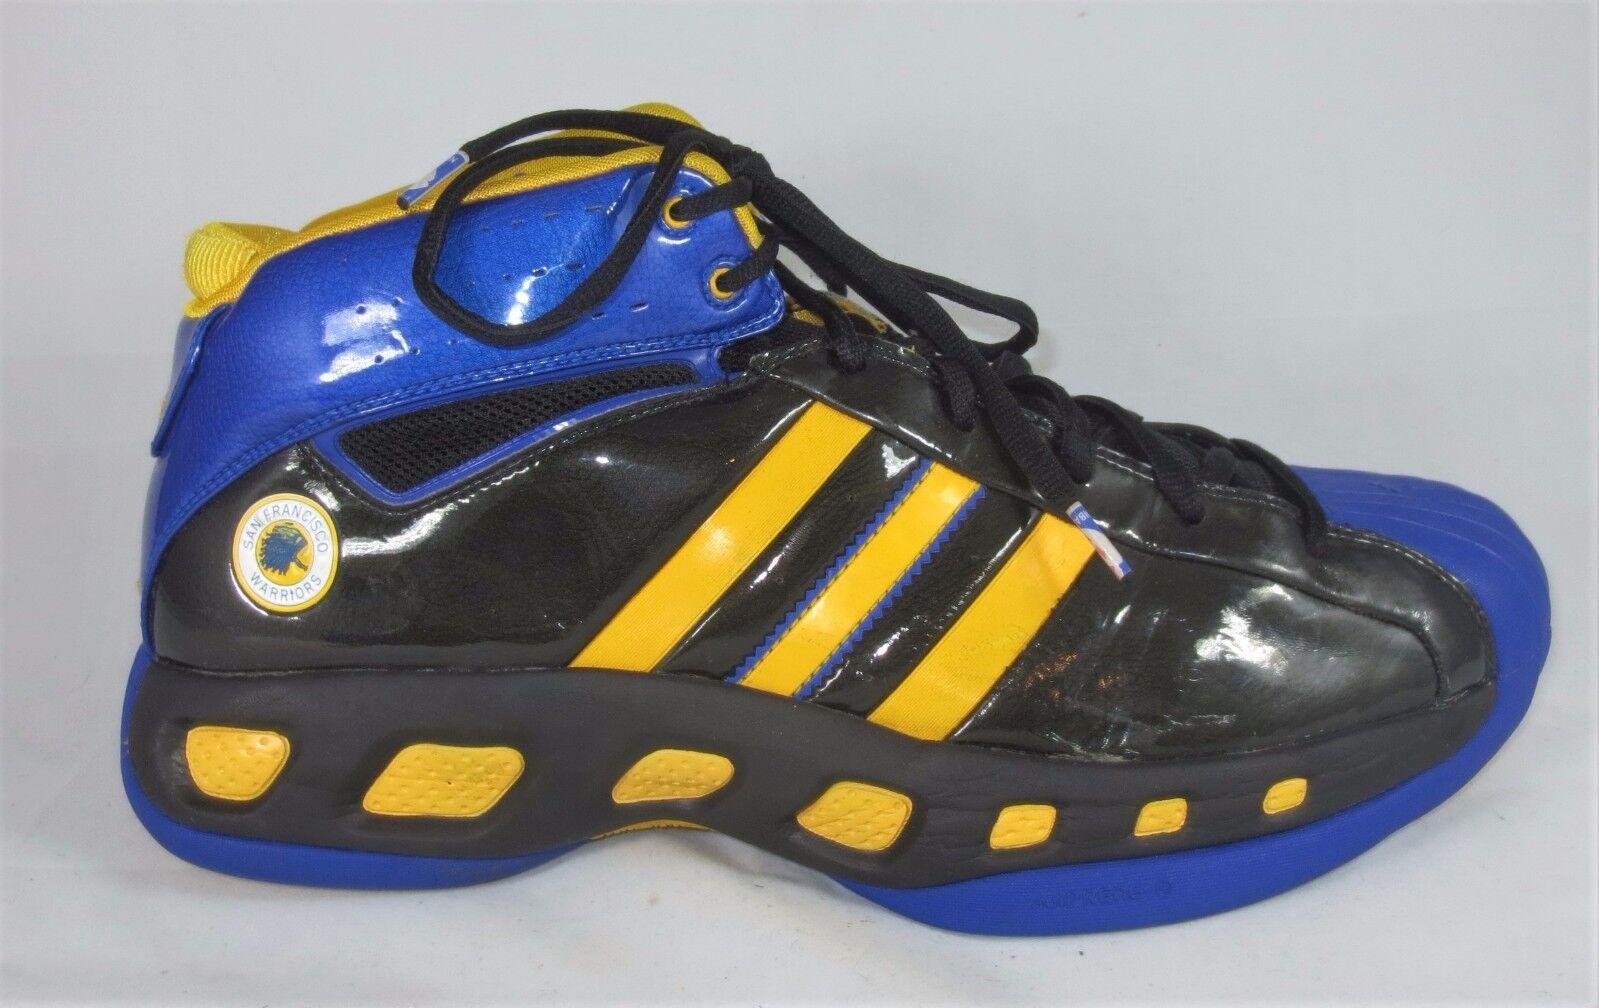 San golden francisco warriors scarpe adidas golden San state guscio la nba retr 15 aa5020